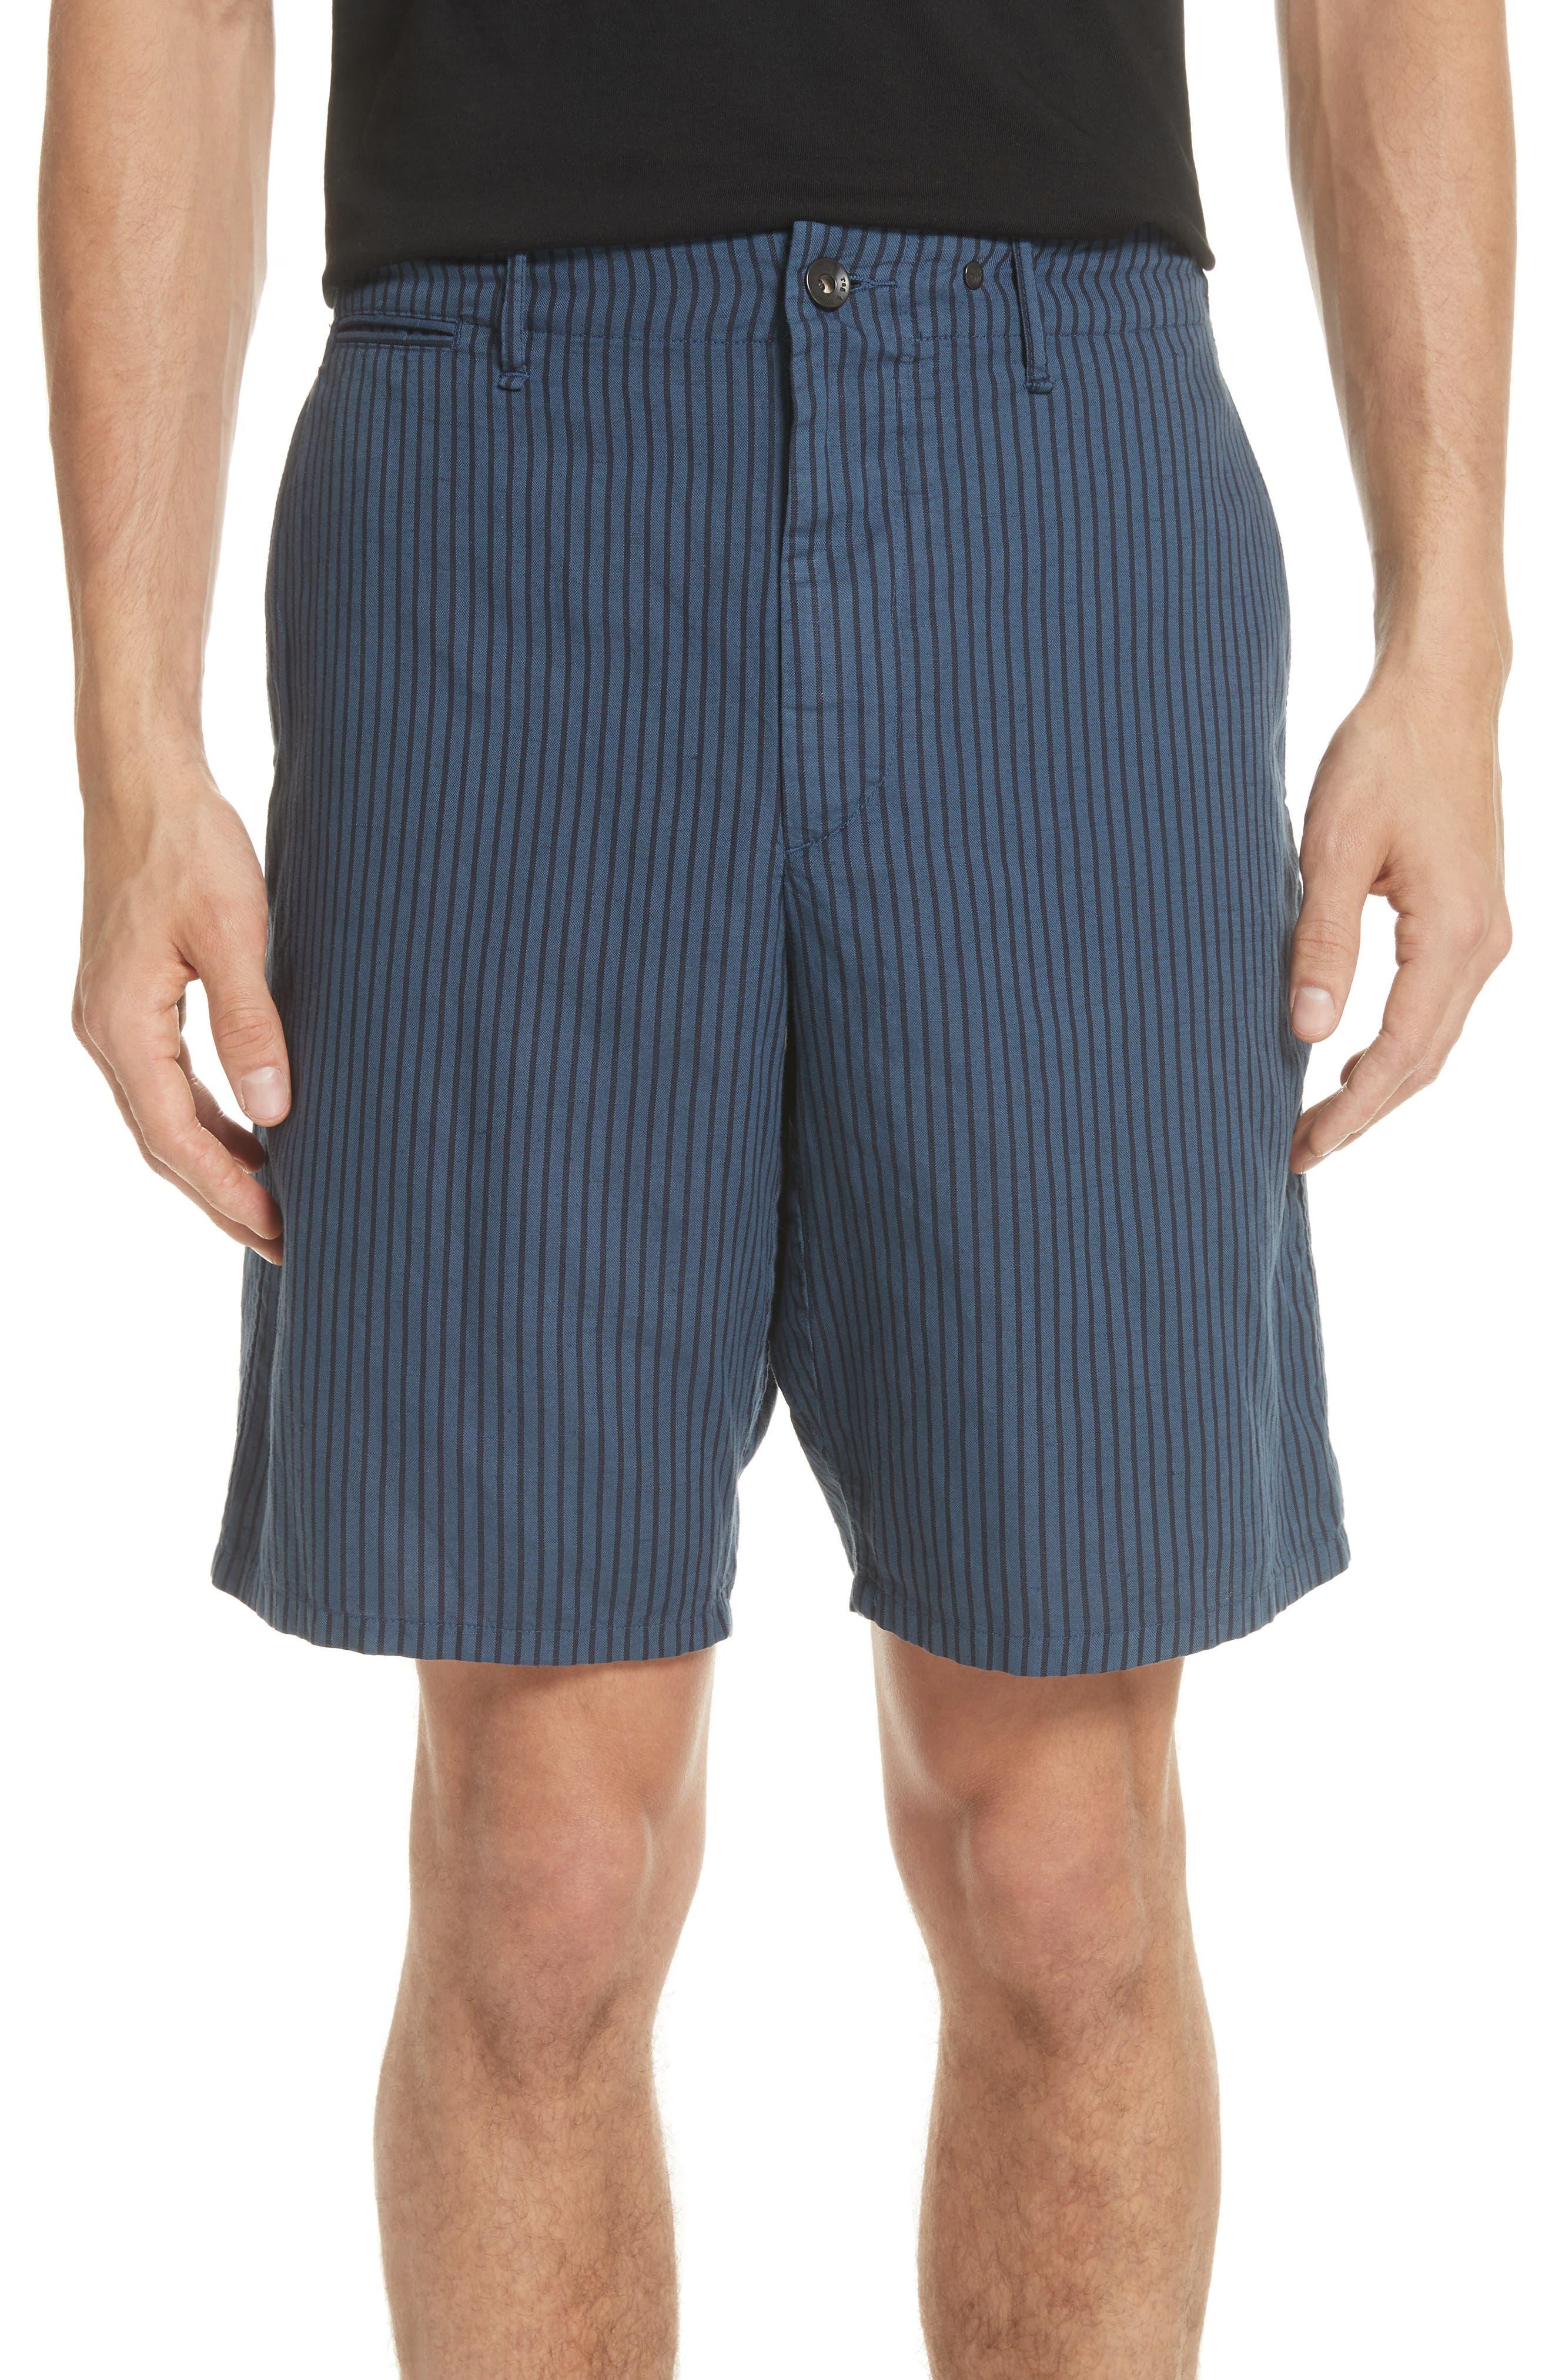 rag + bone Stripe Shorts,                             Main thumbnail 1, color,                             Navy Stripe